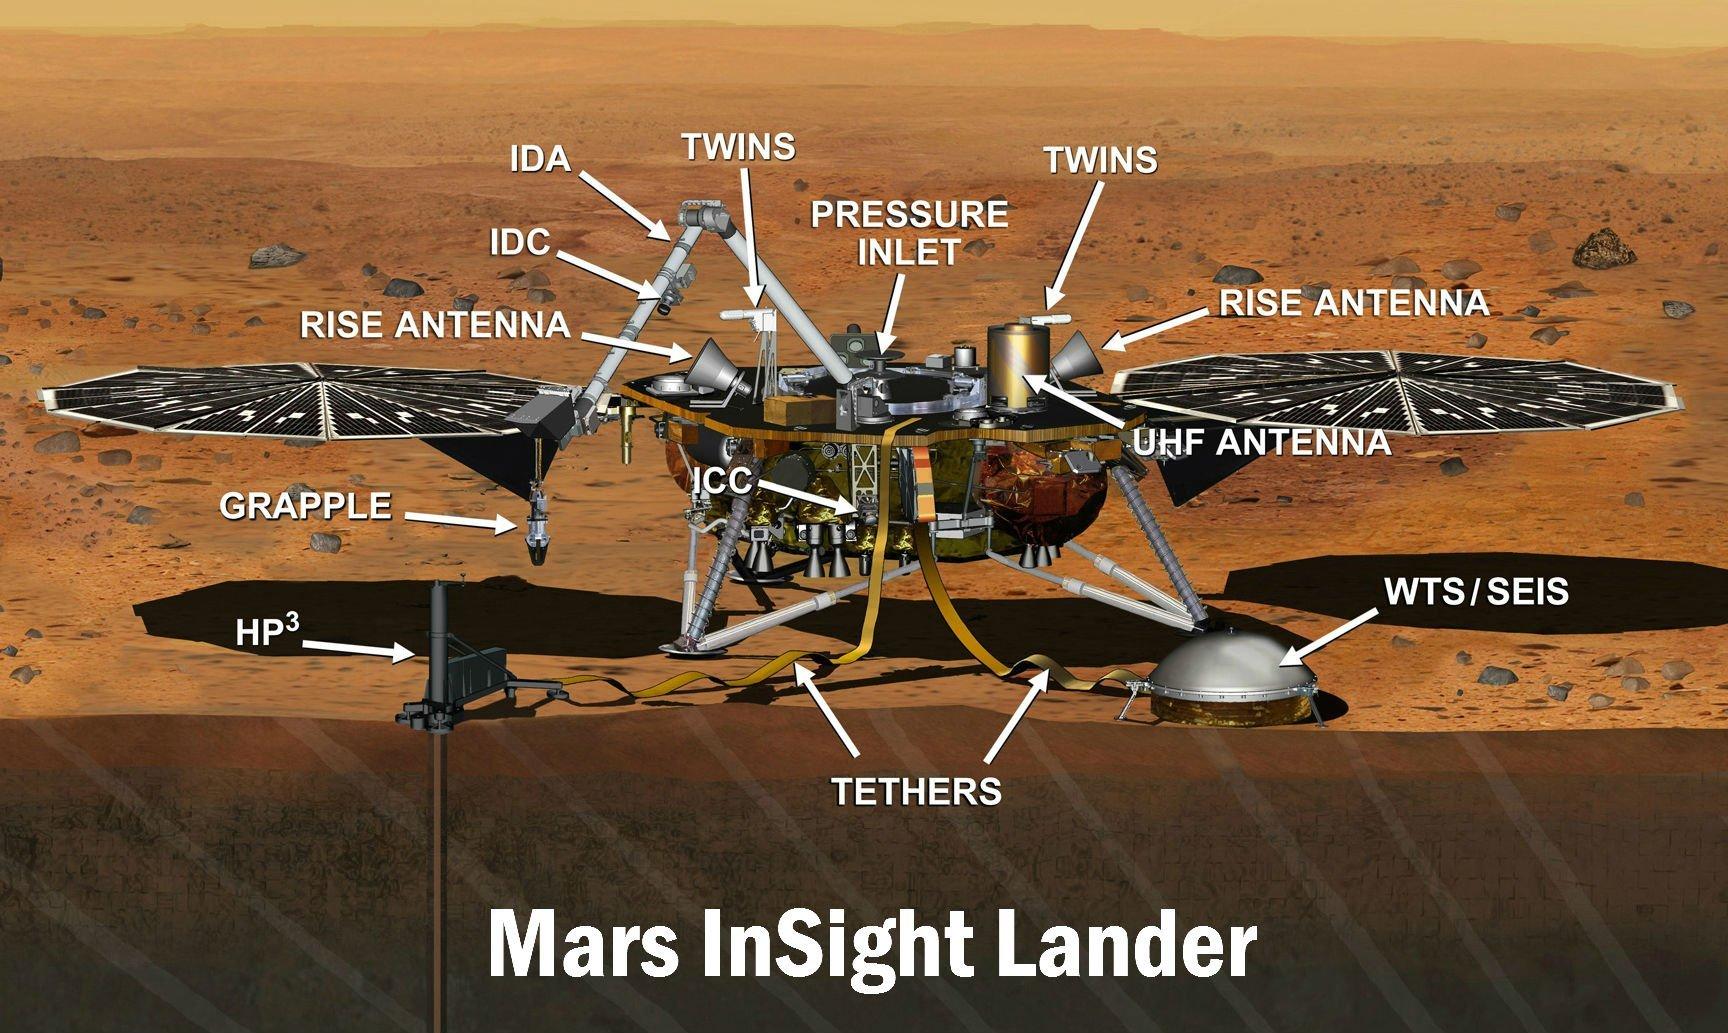 Mars Insight Lander Labelled, Planeta Incógnito